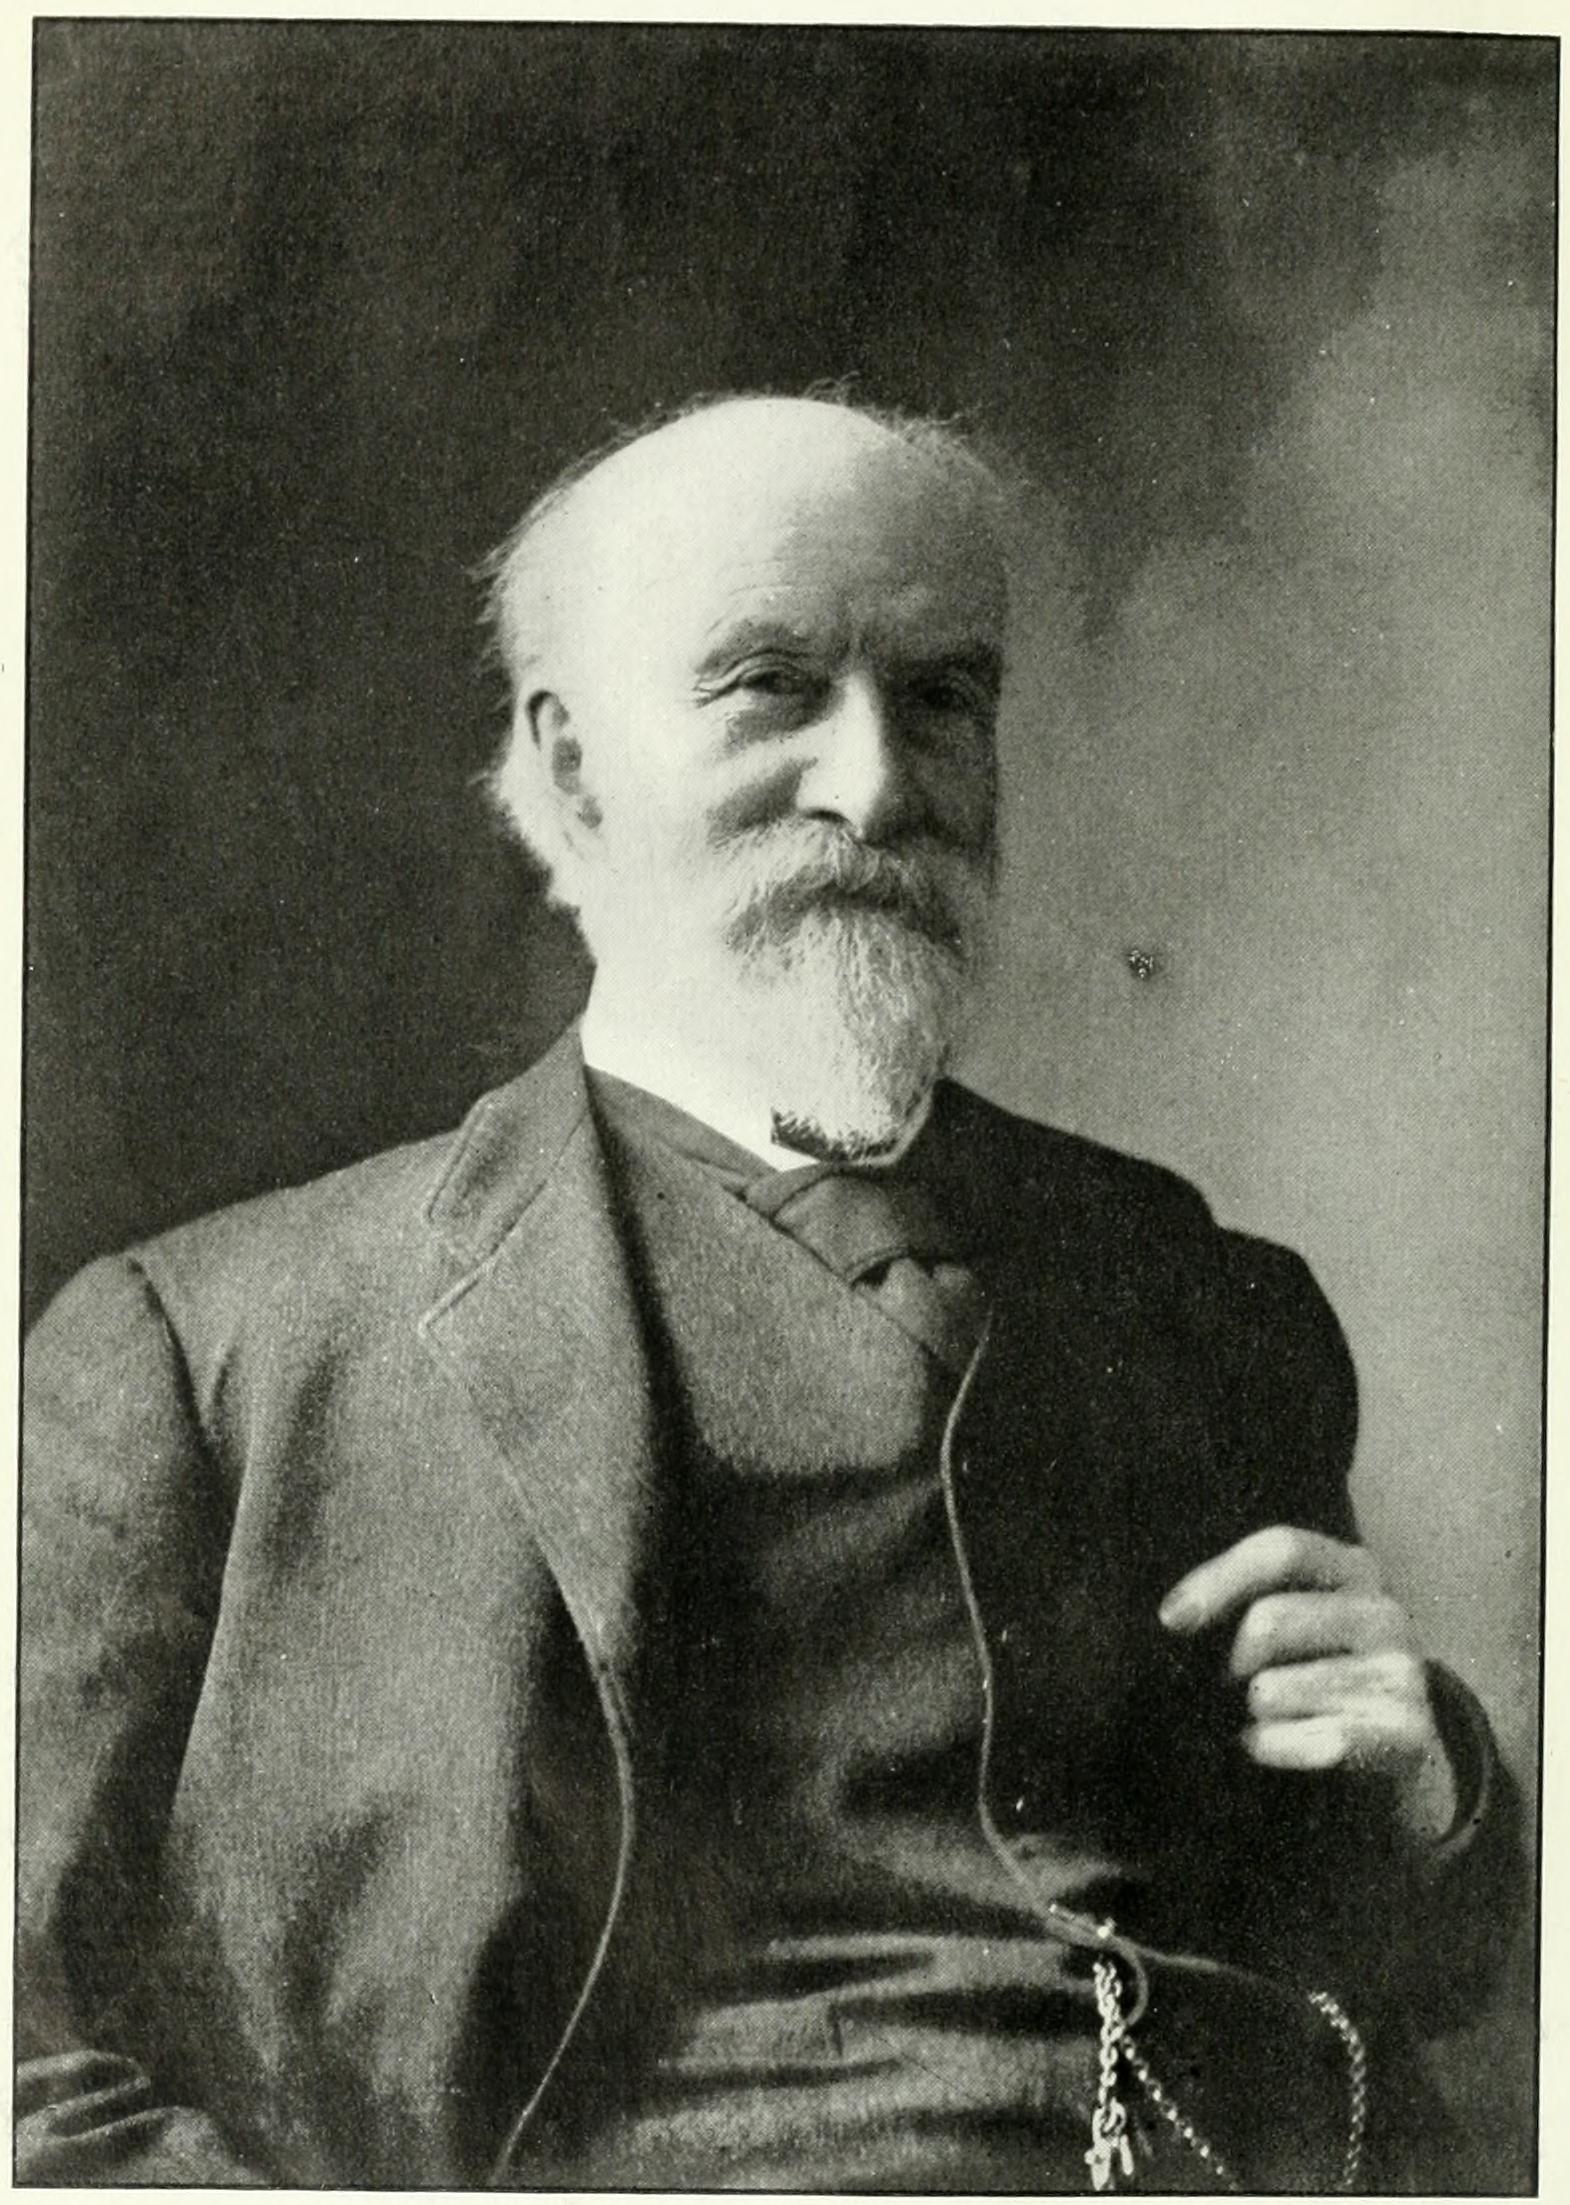 Sanford Fleming circa 1907